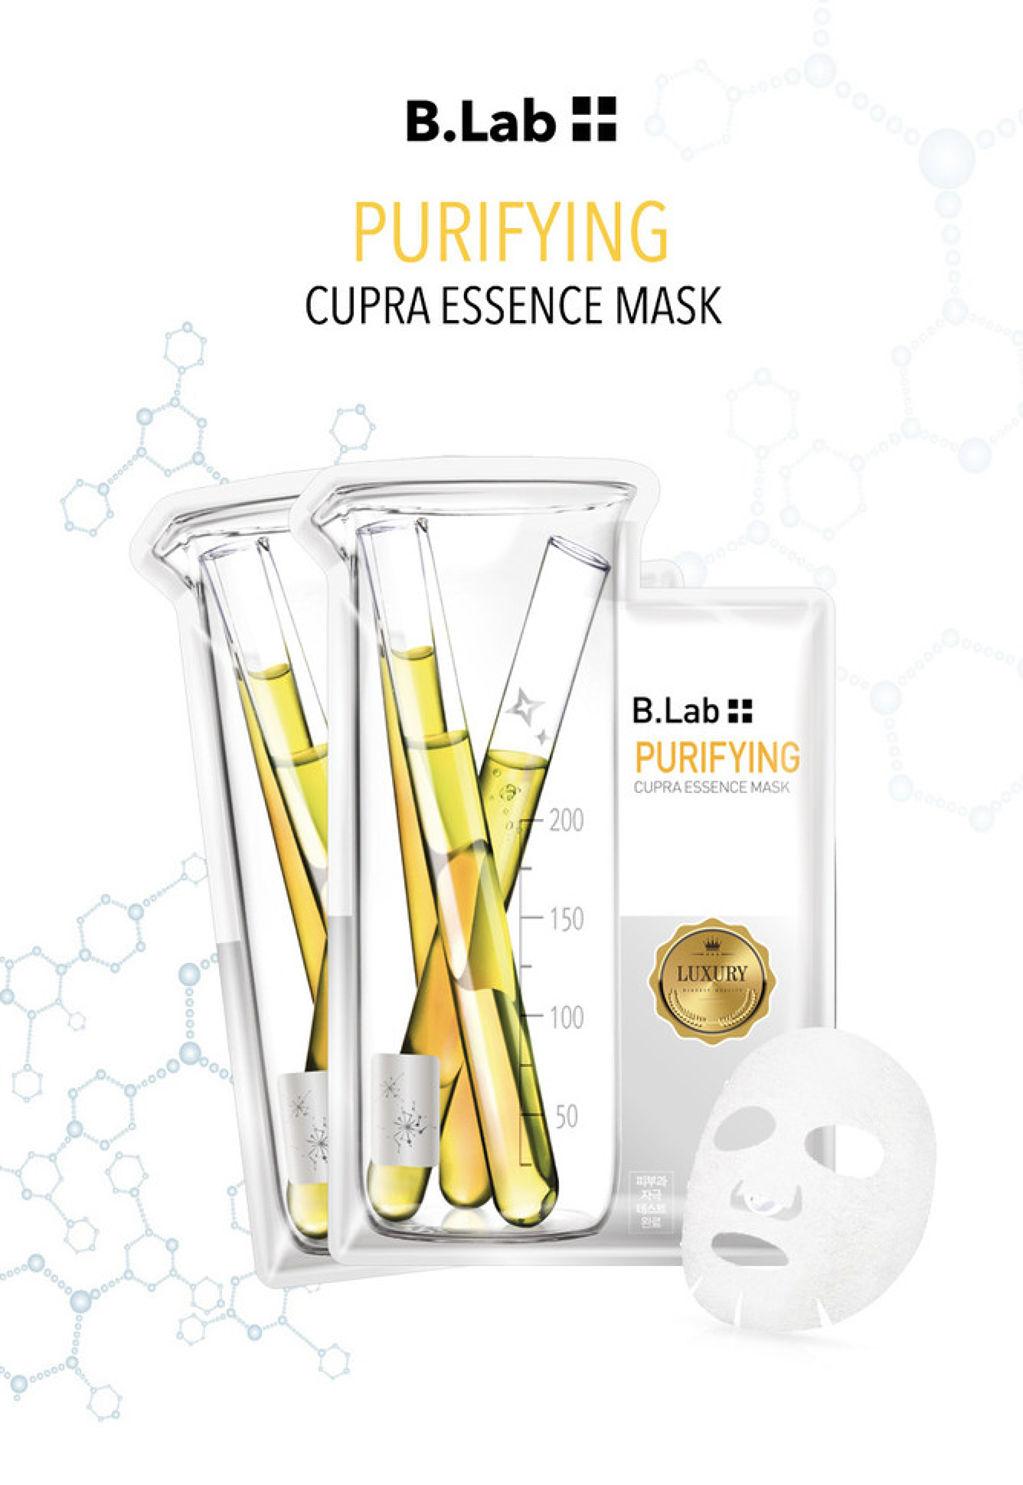 B.Lab Purifying Cupra Essence Mask - b6896-purifying-1.jpg